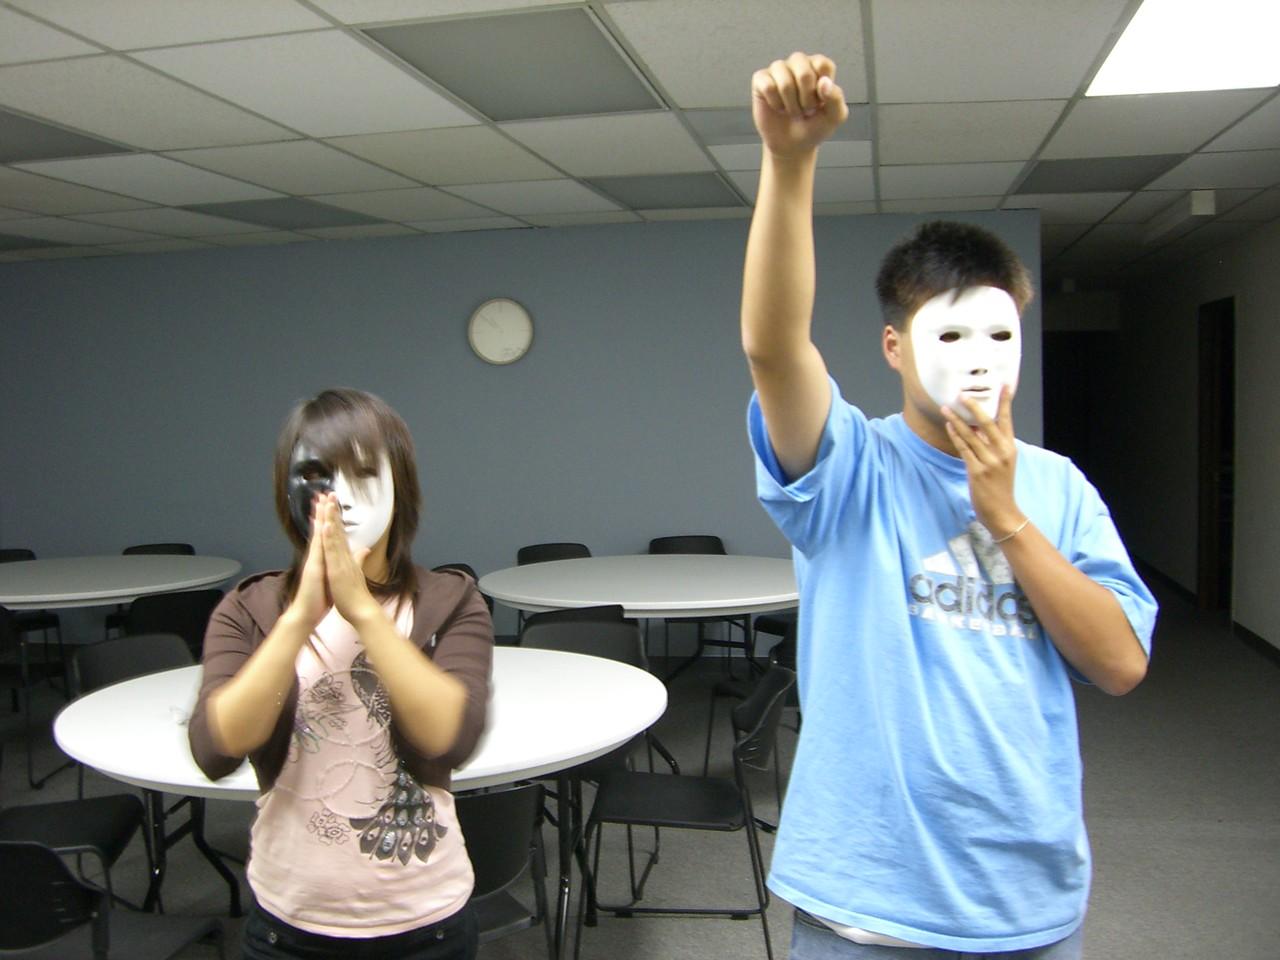 2006 06 16 Fri - Shinae Kim & Isaac Choi rehearsing 'King of Hearts'